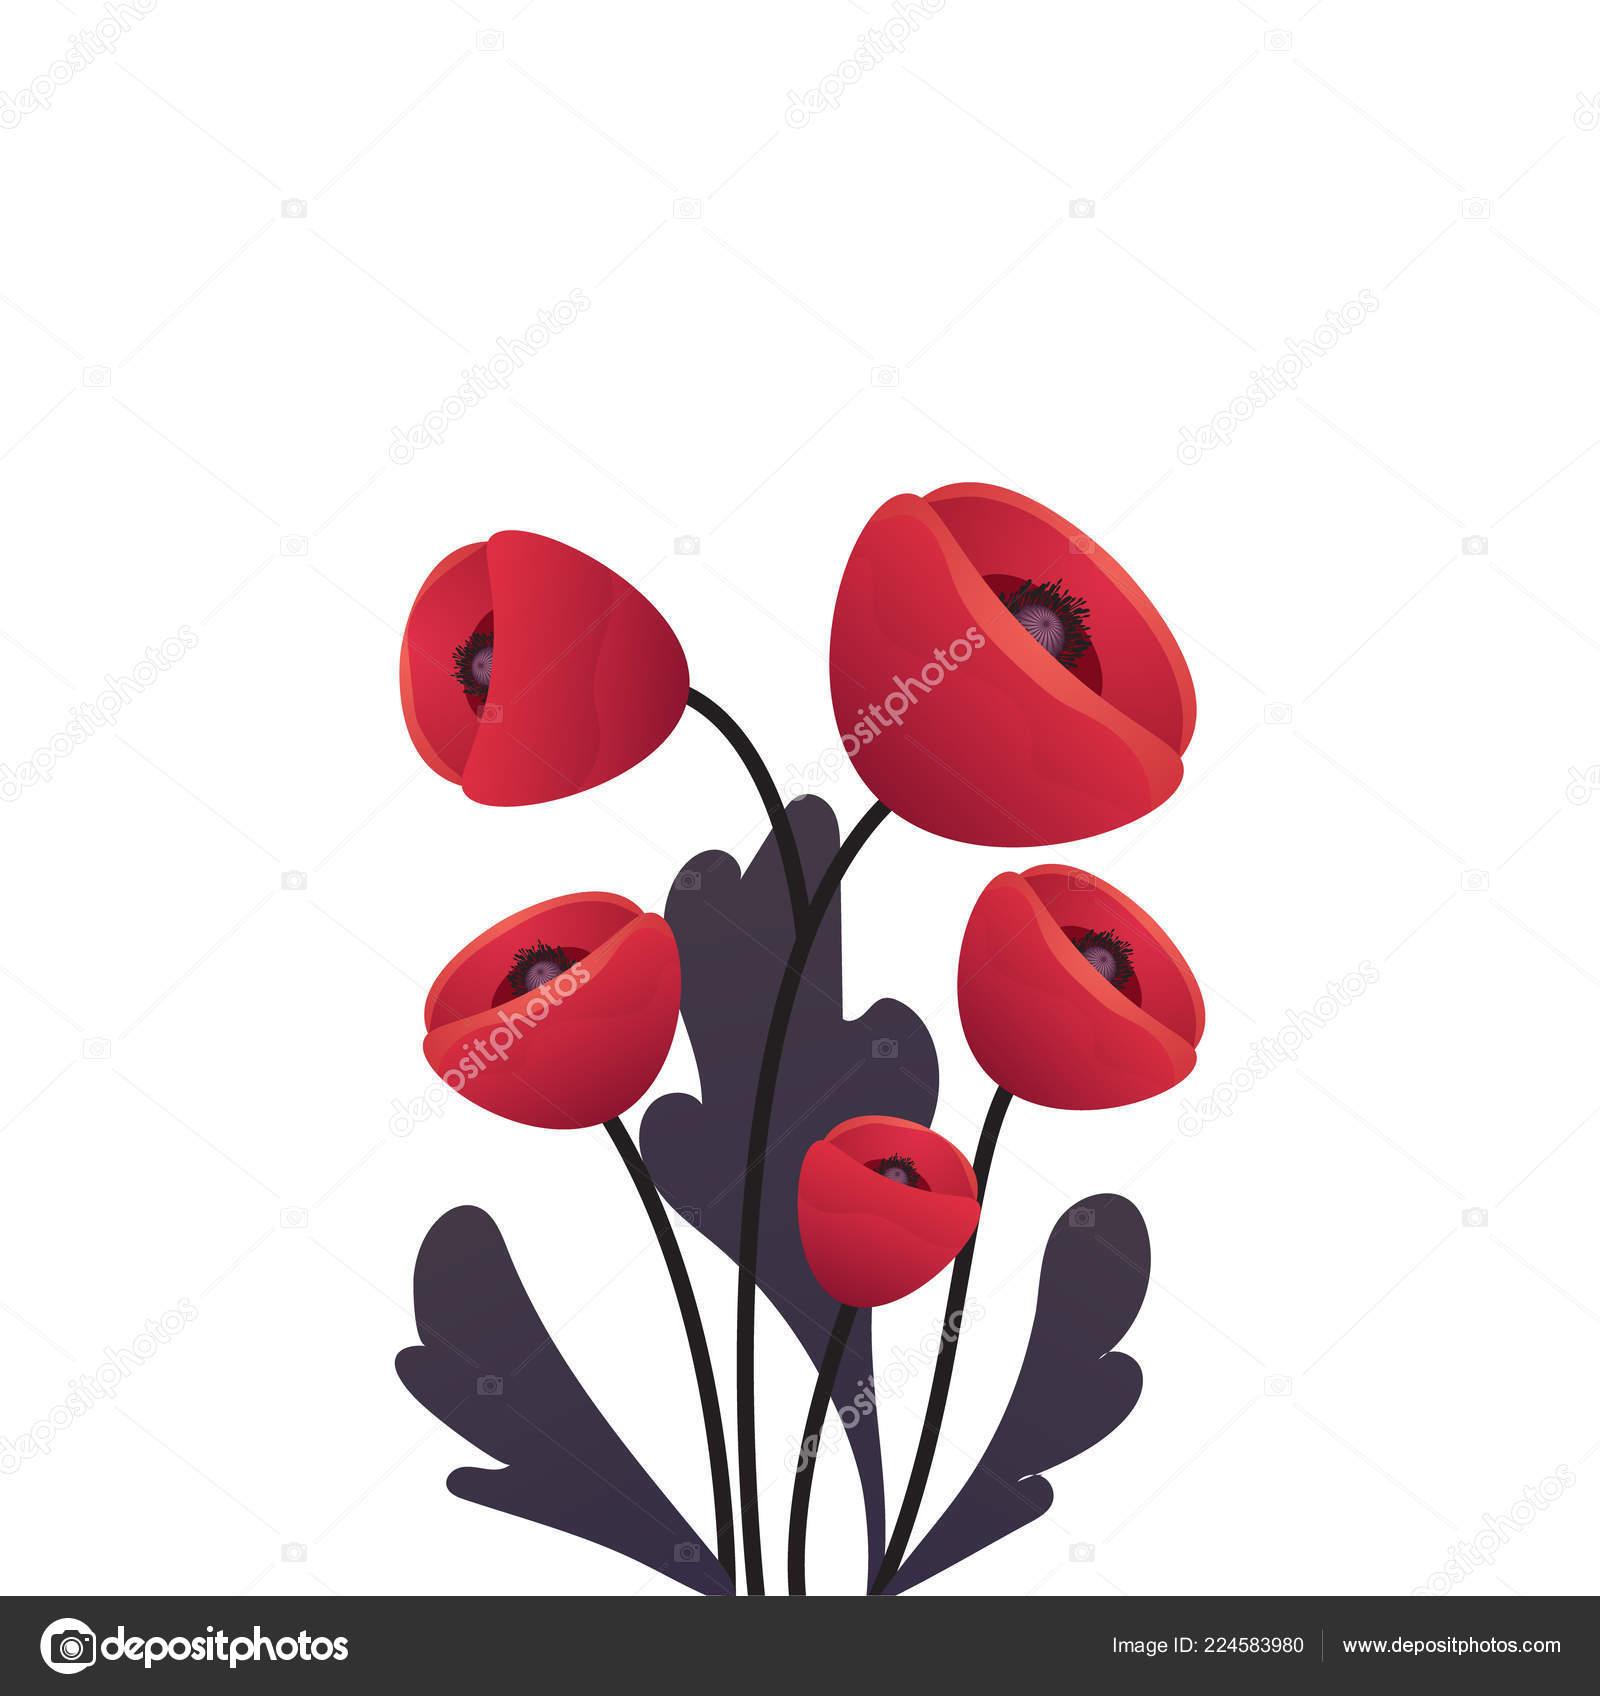 Realistic Red Poppy Flower Branch International Symbol Of Peace